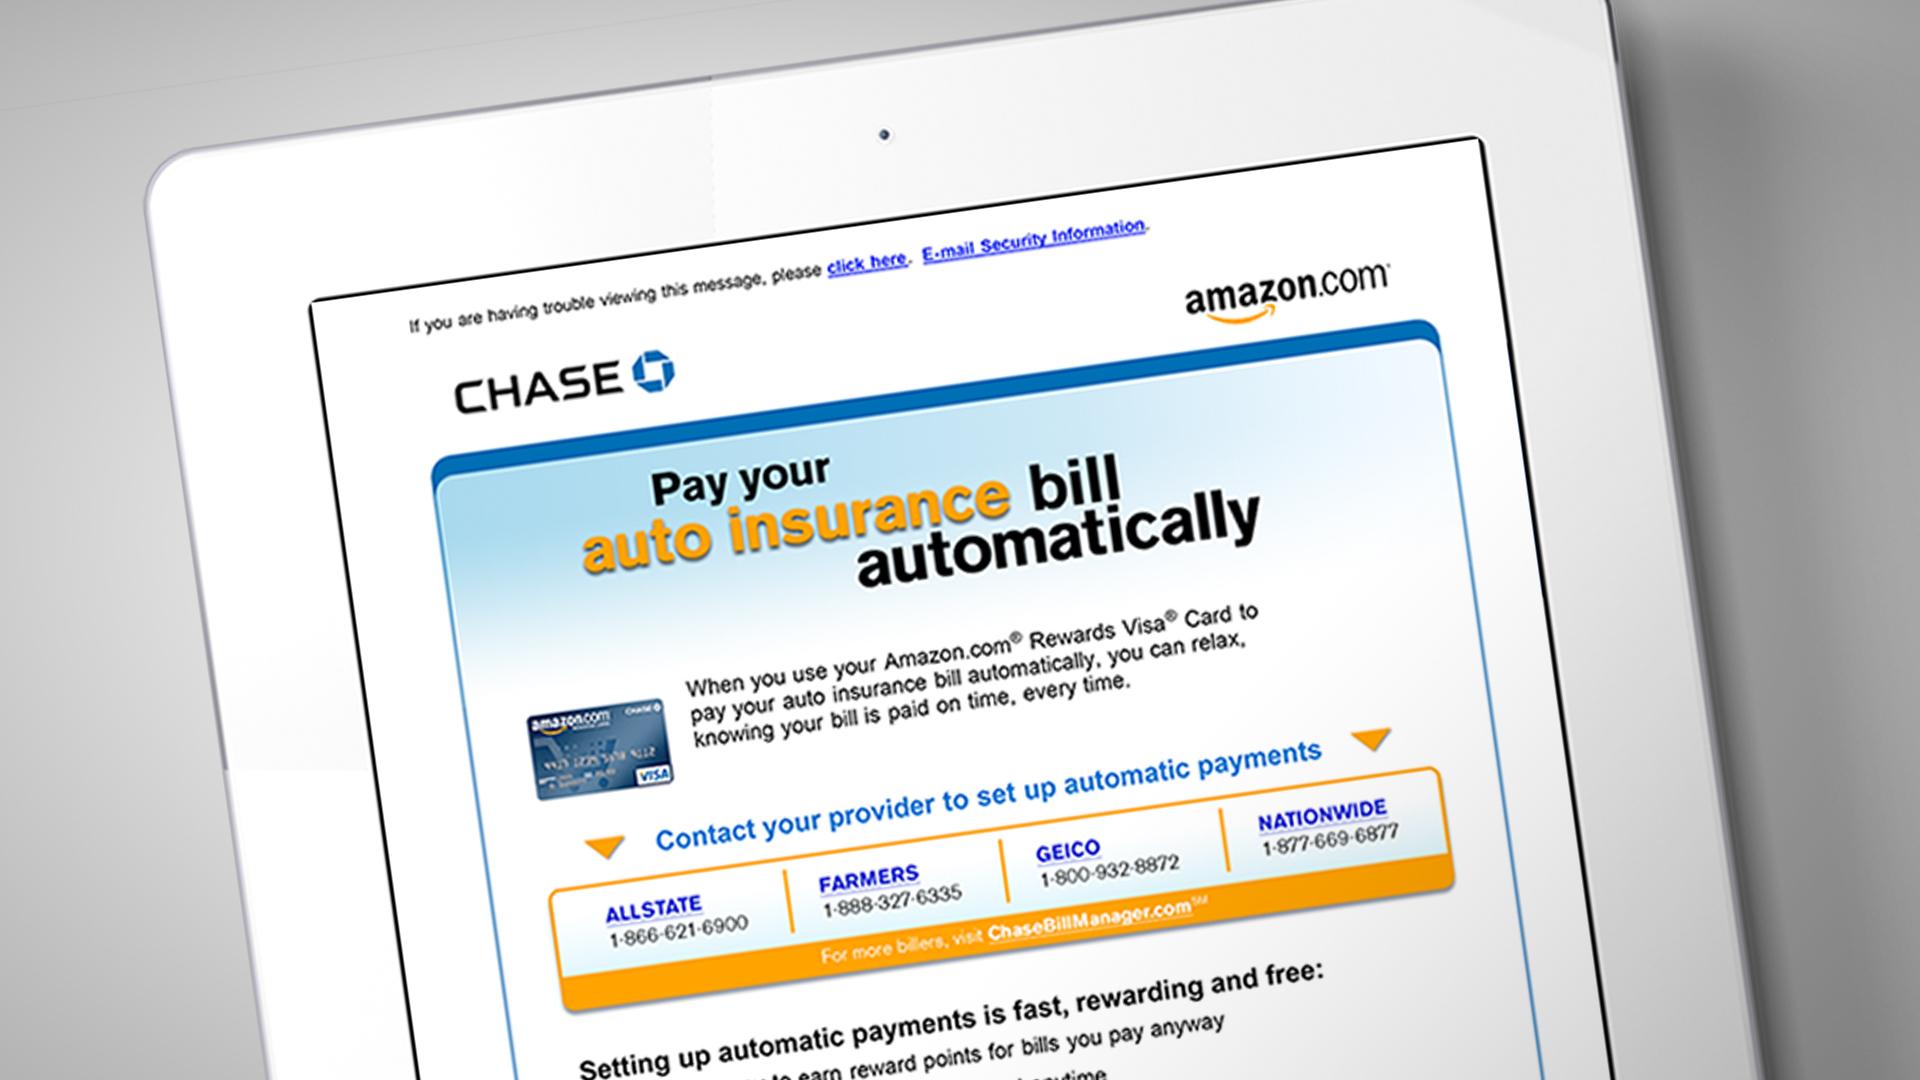 25924-Chase-Bill-Pay-C3-Amazon-Email-16x9-V2.jpg